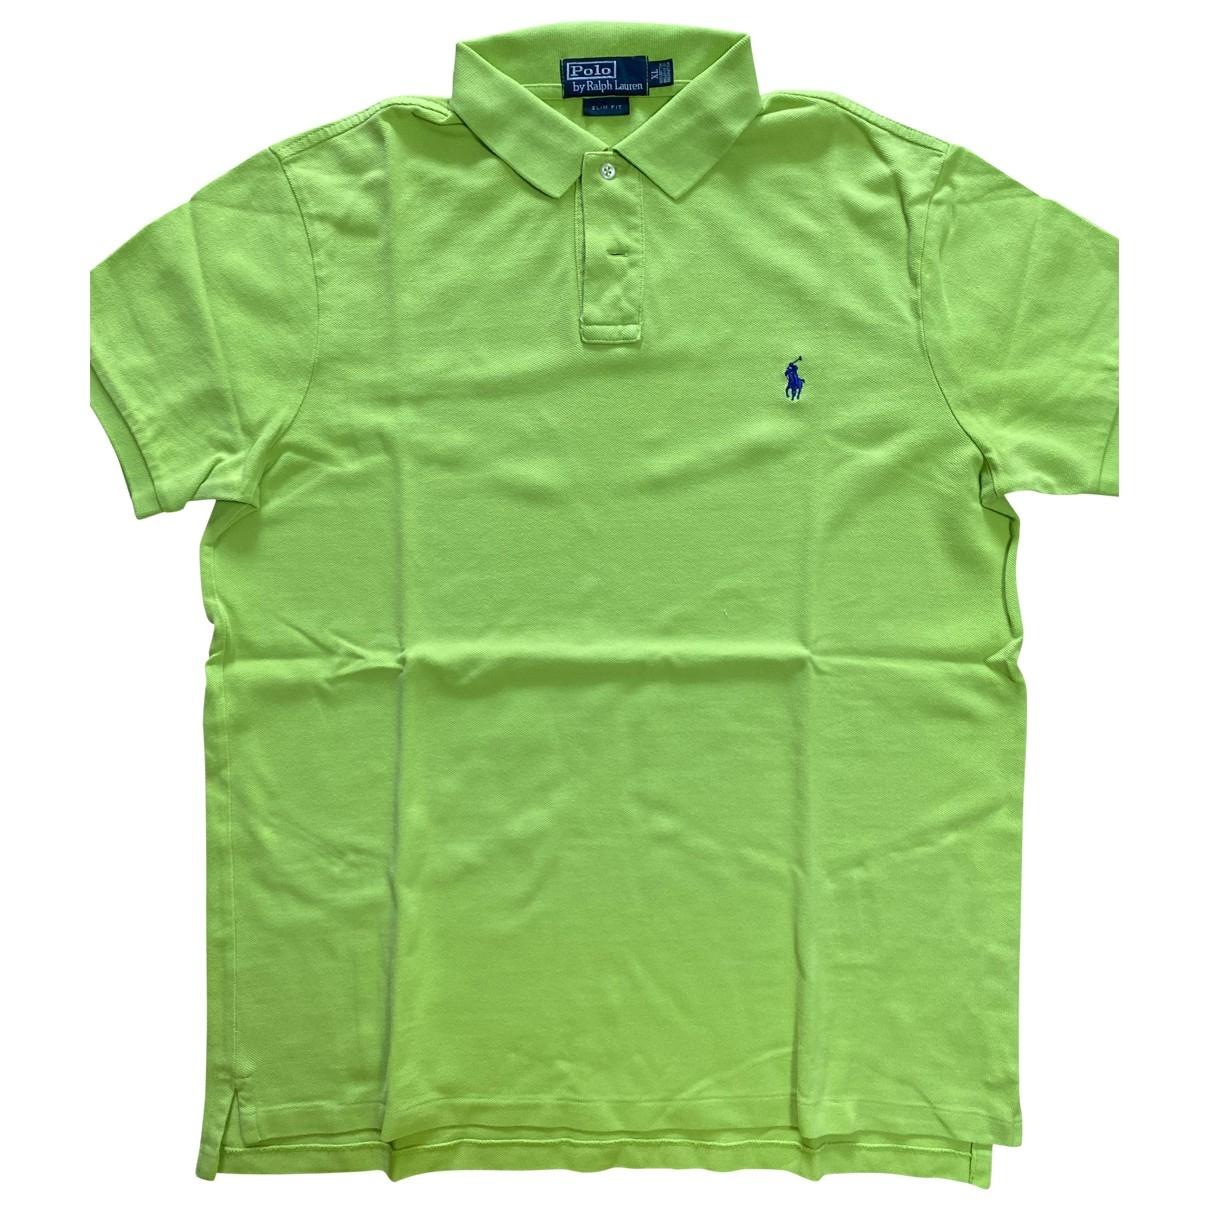 Polo Ralph Lauren - Polos Polo classique manches courtes pour homme en coton - vert